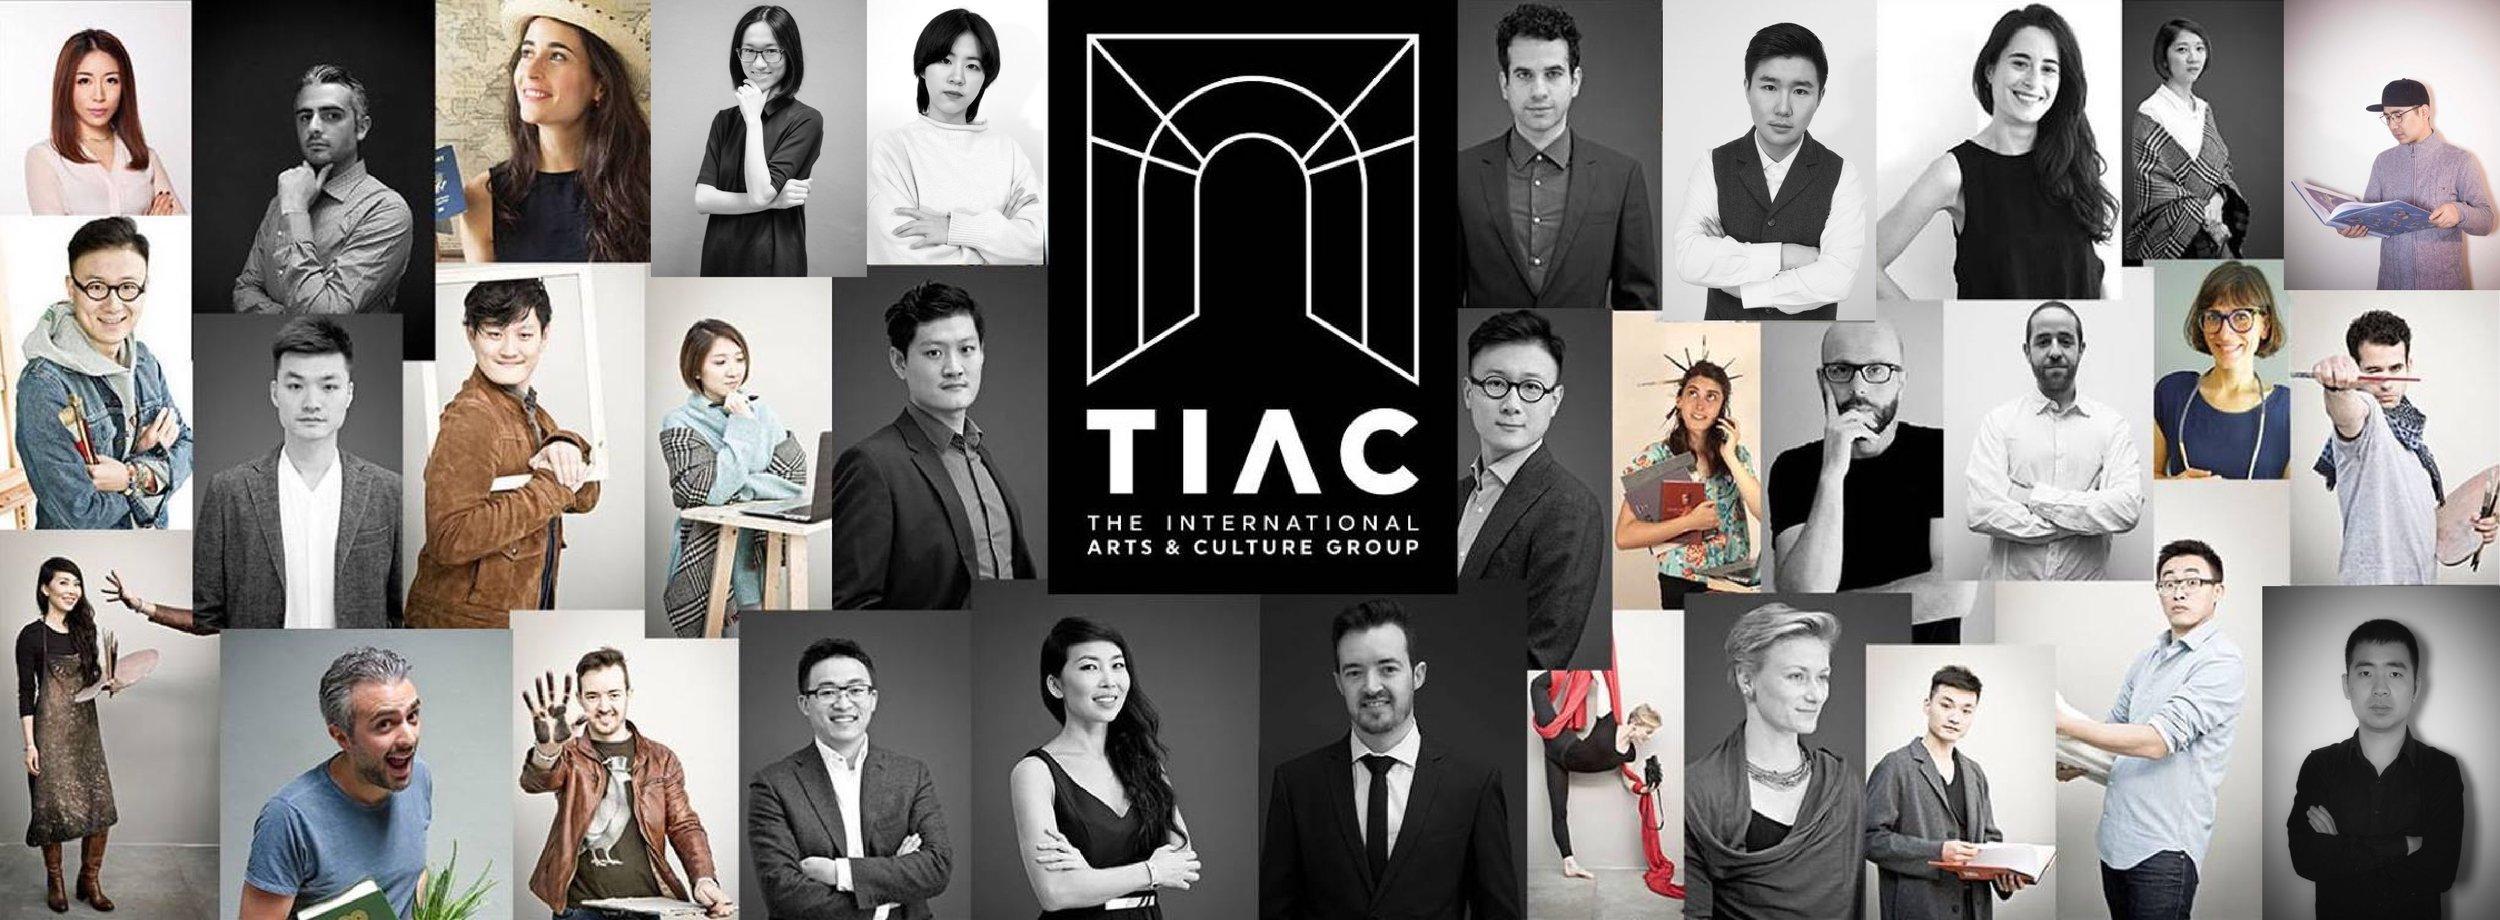 TIAC group collage xd sma.jpg